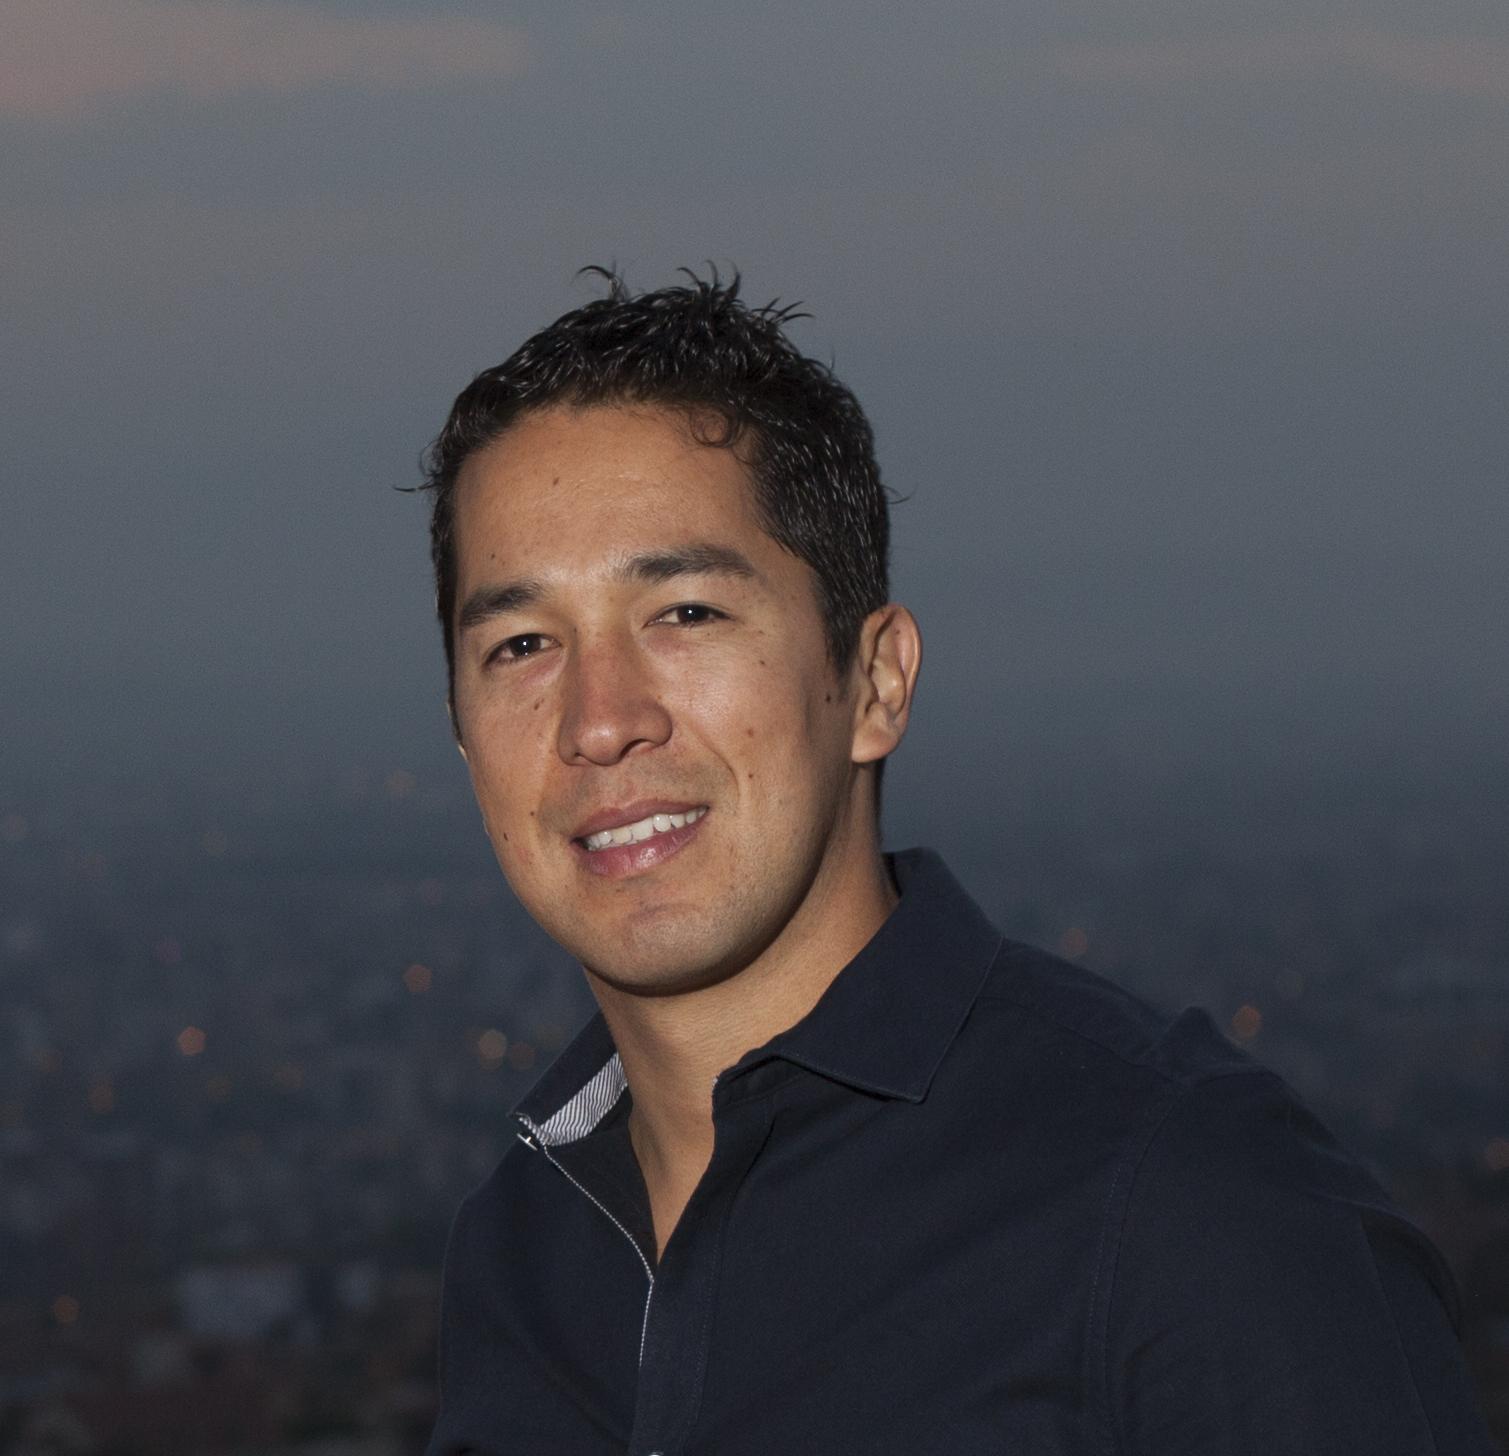 Daniel Ponce Gandarillas